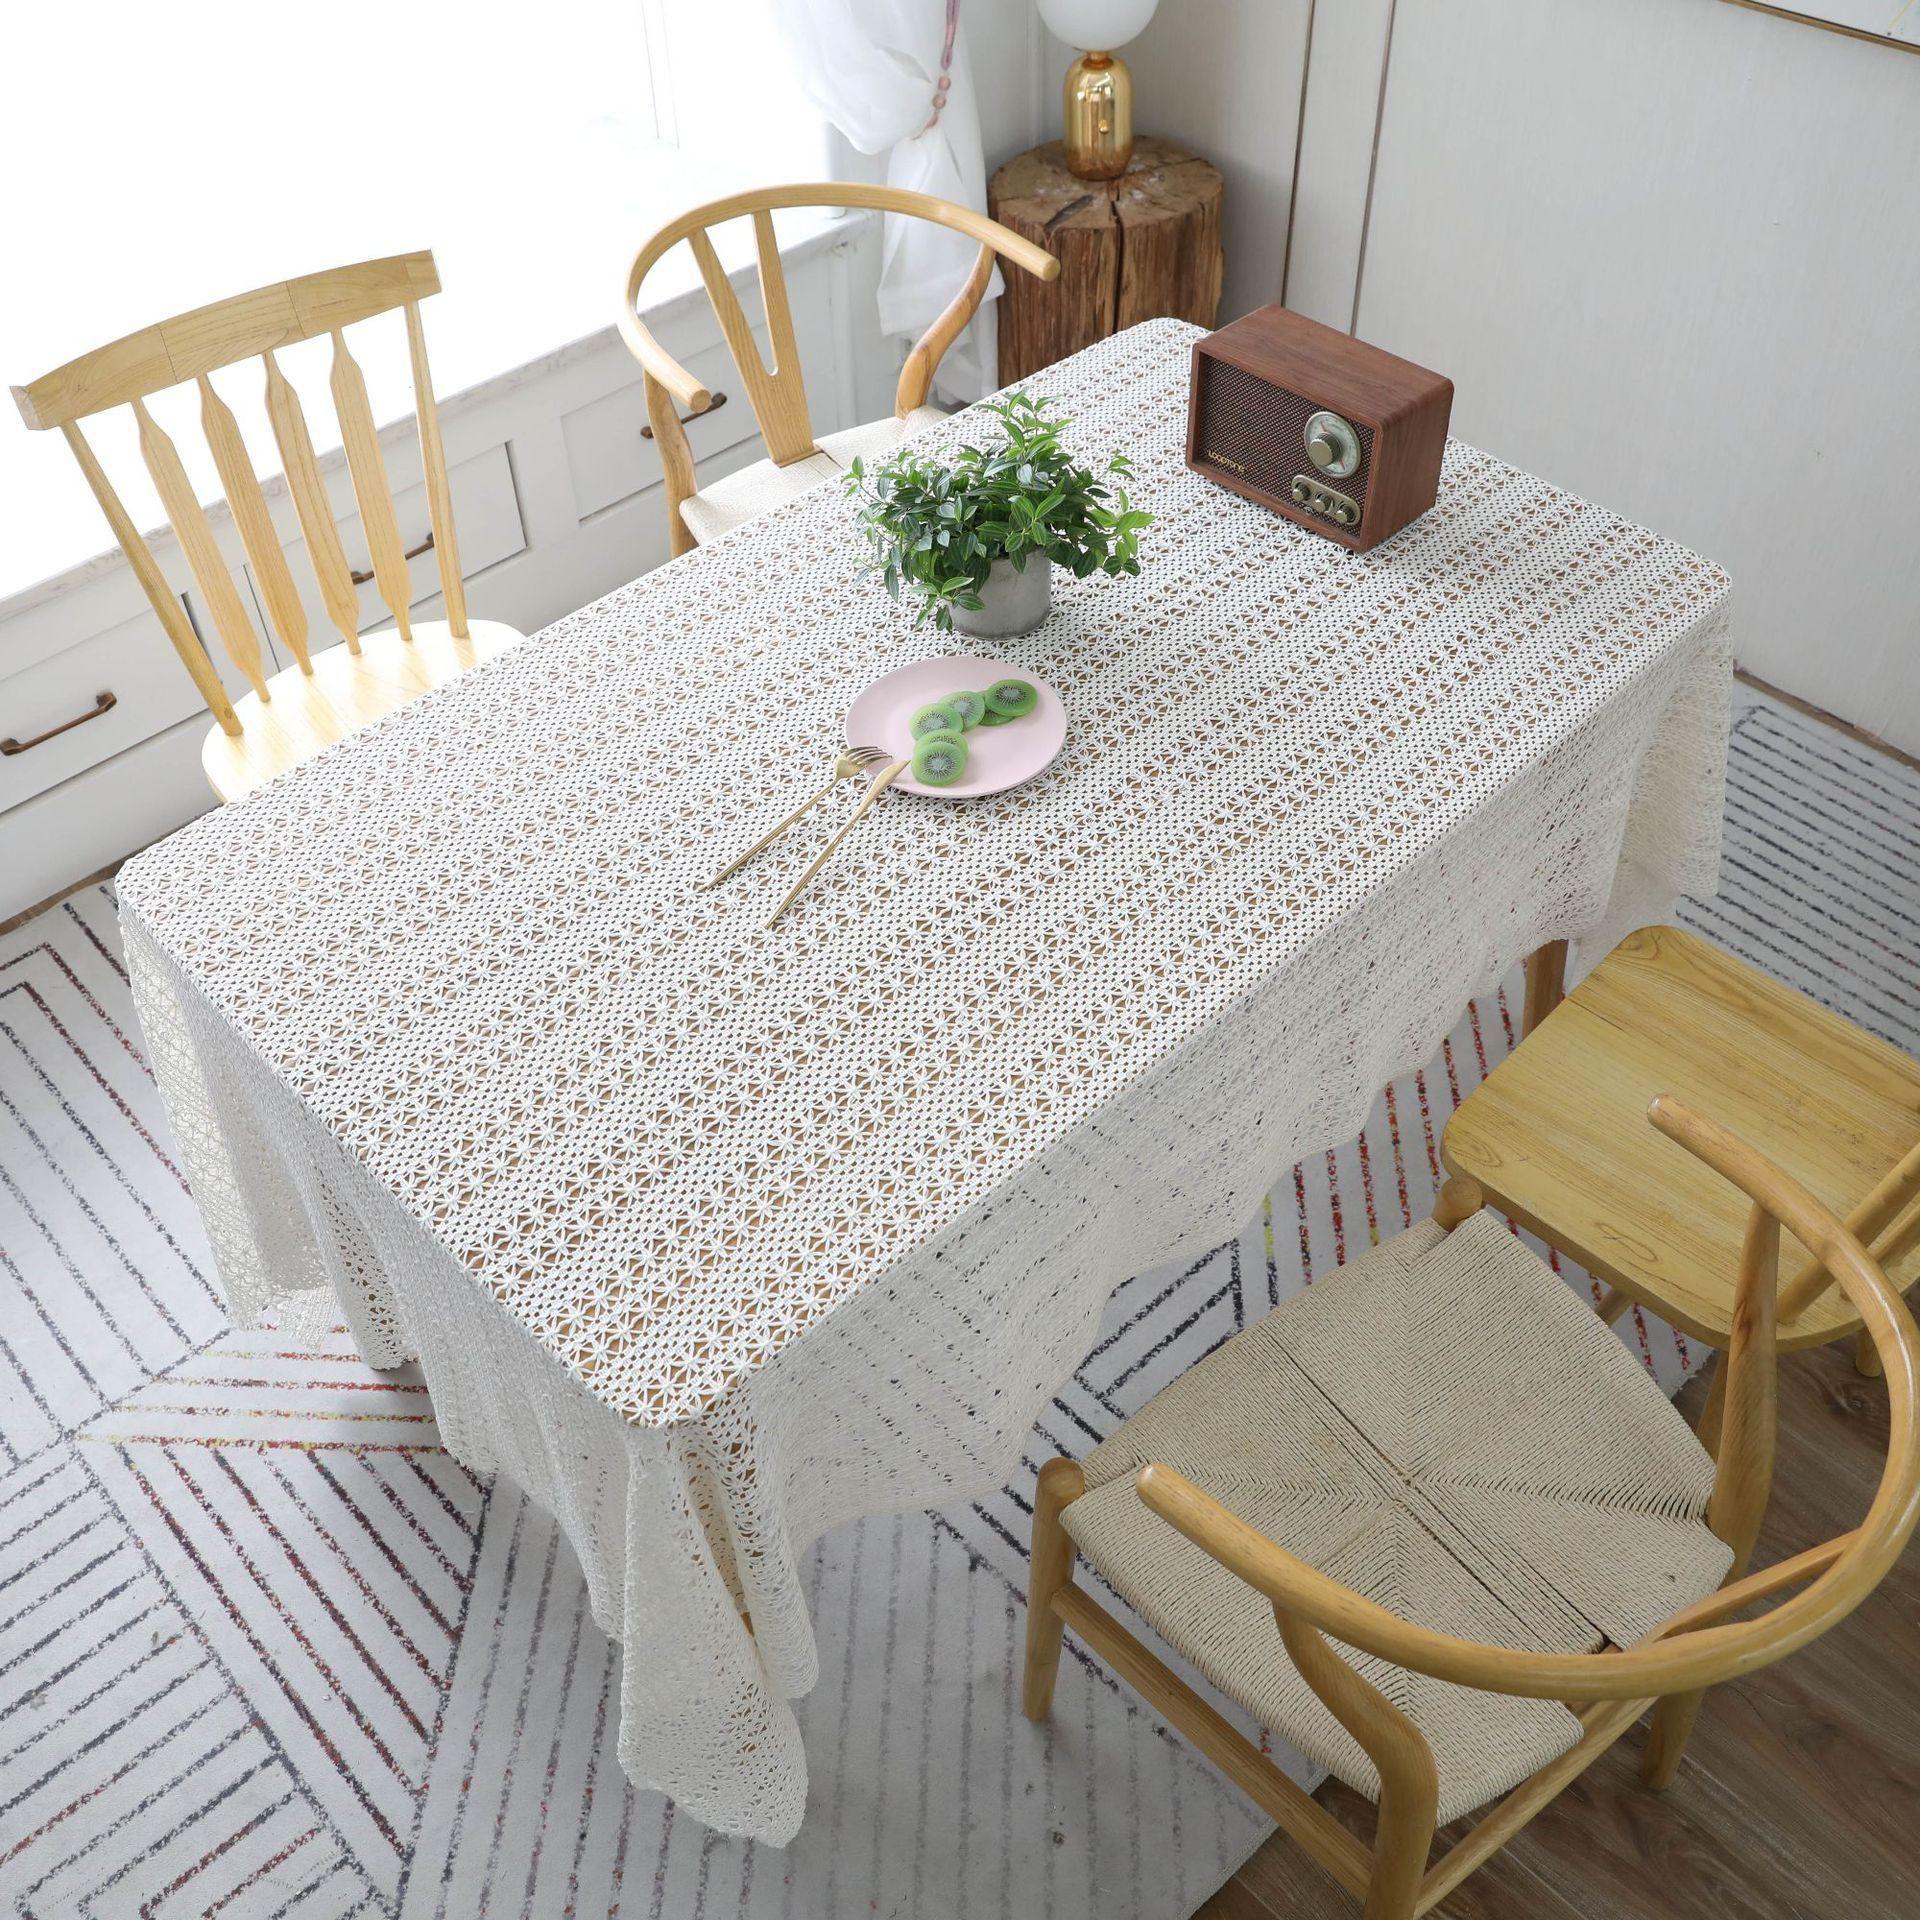 JH Lace Crochet Toalha de mesa de algodão tecido escavado Antependium New Piano toalha tampa tiro Props Lace pano